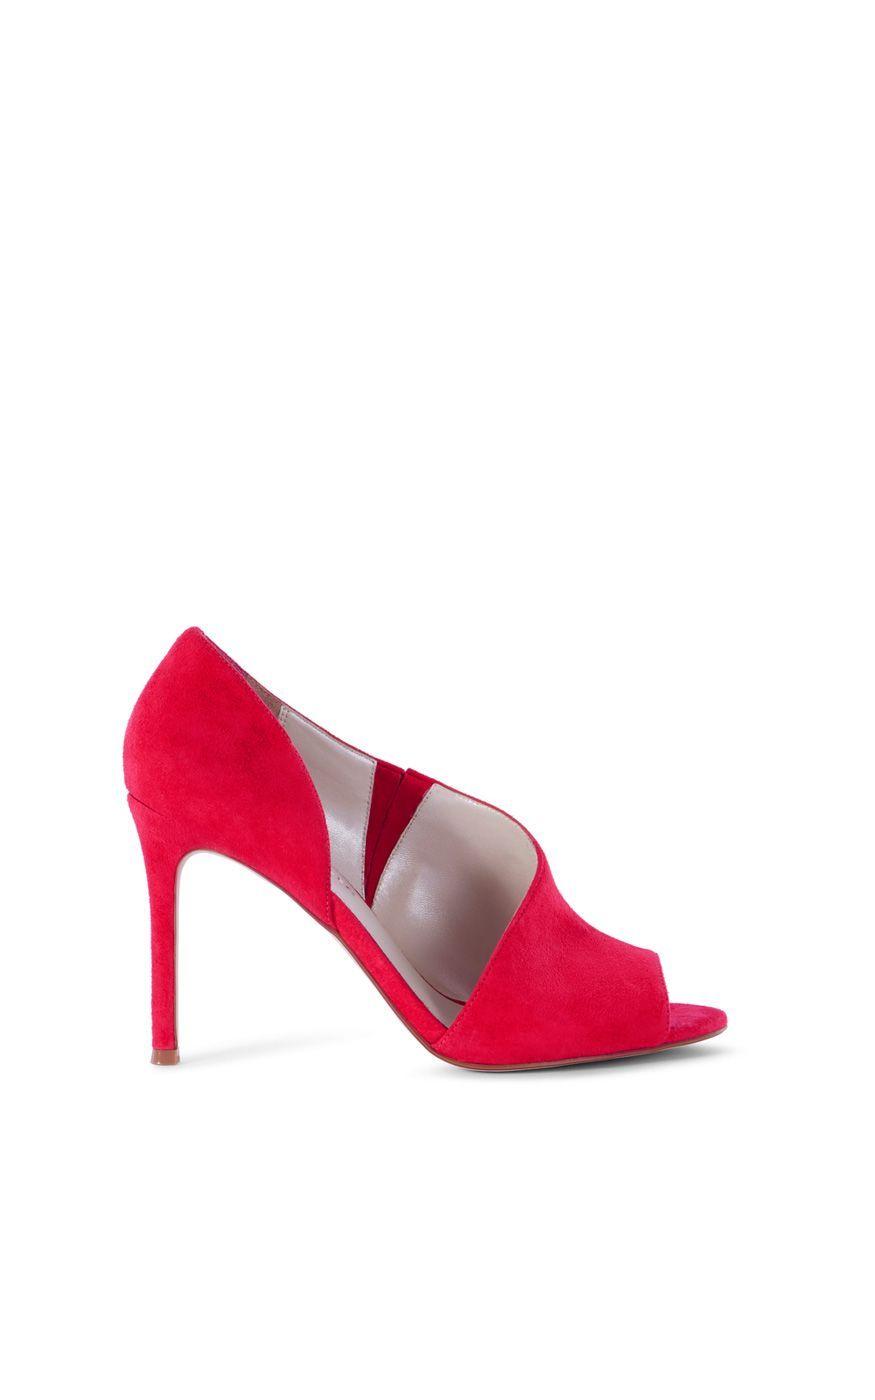 8709408333 Karen Millen Suede Asymmetric Peep-Toe Shoe, Pink | Ladies Shoes ...